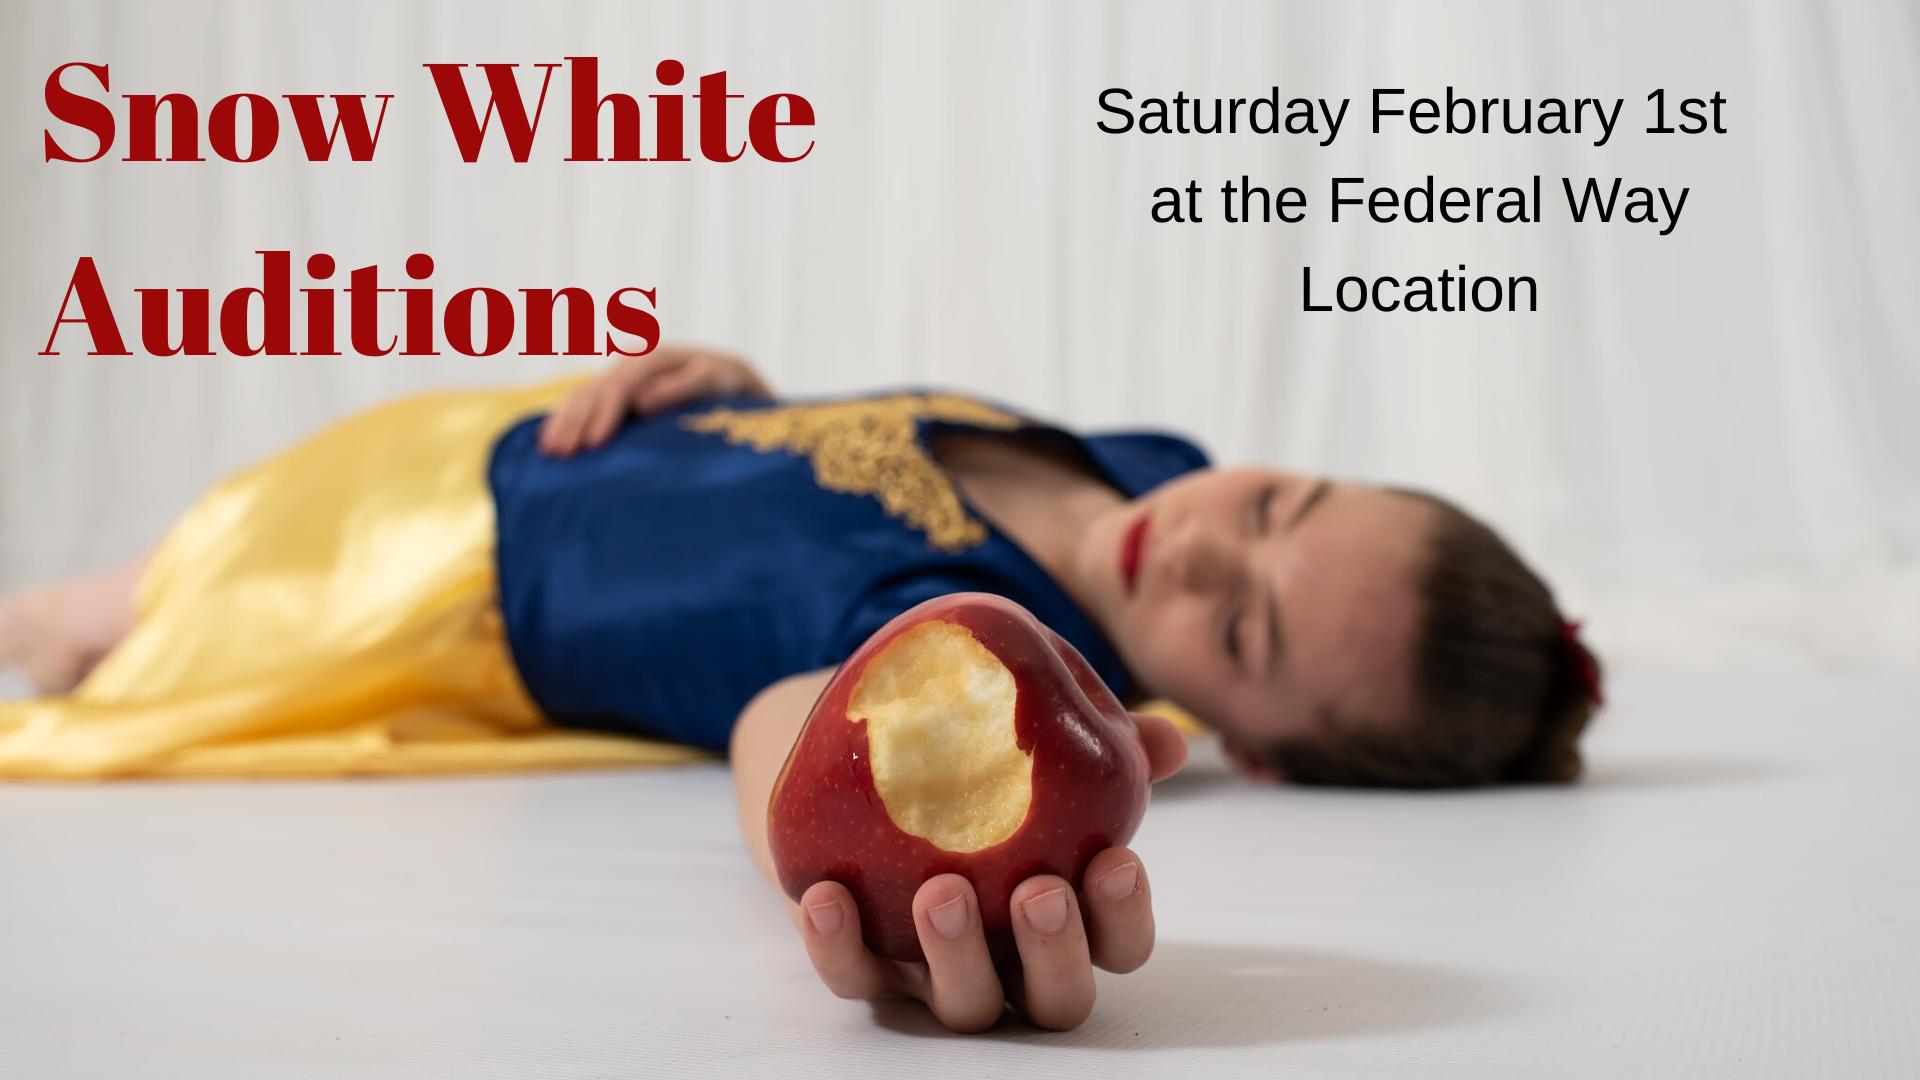 Snow White Auditions headder